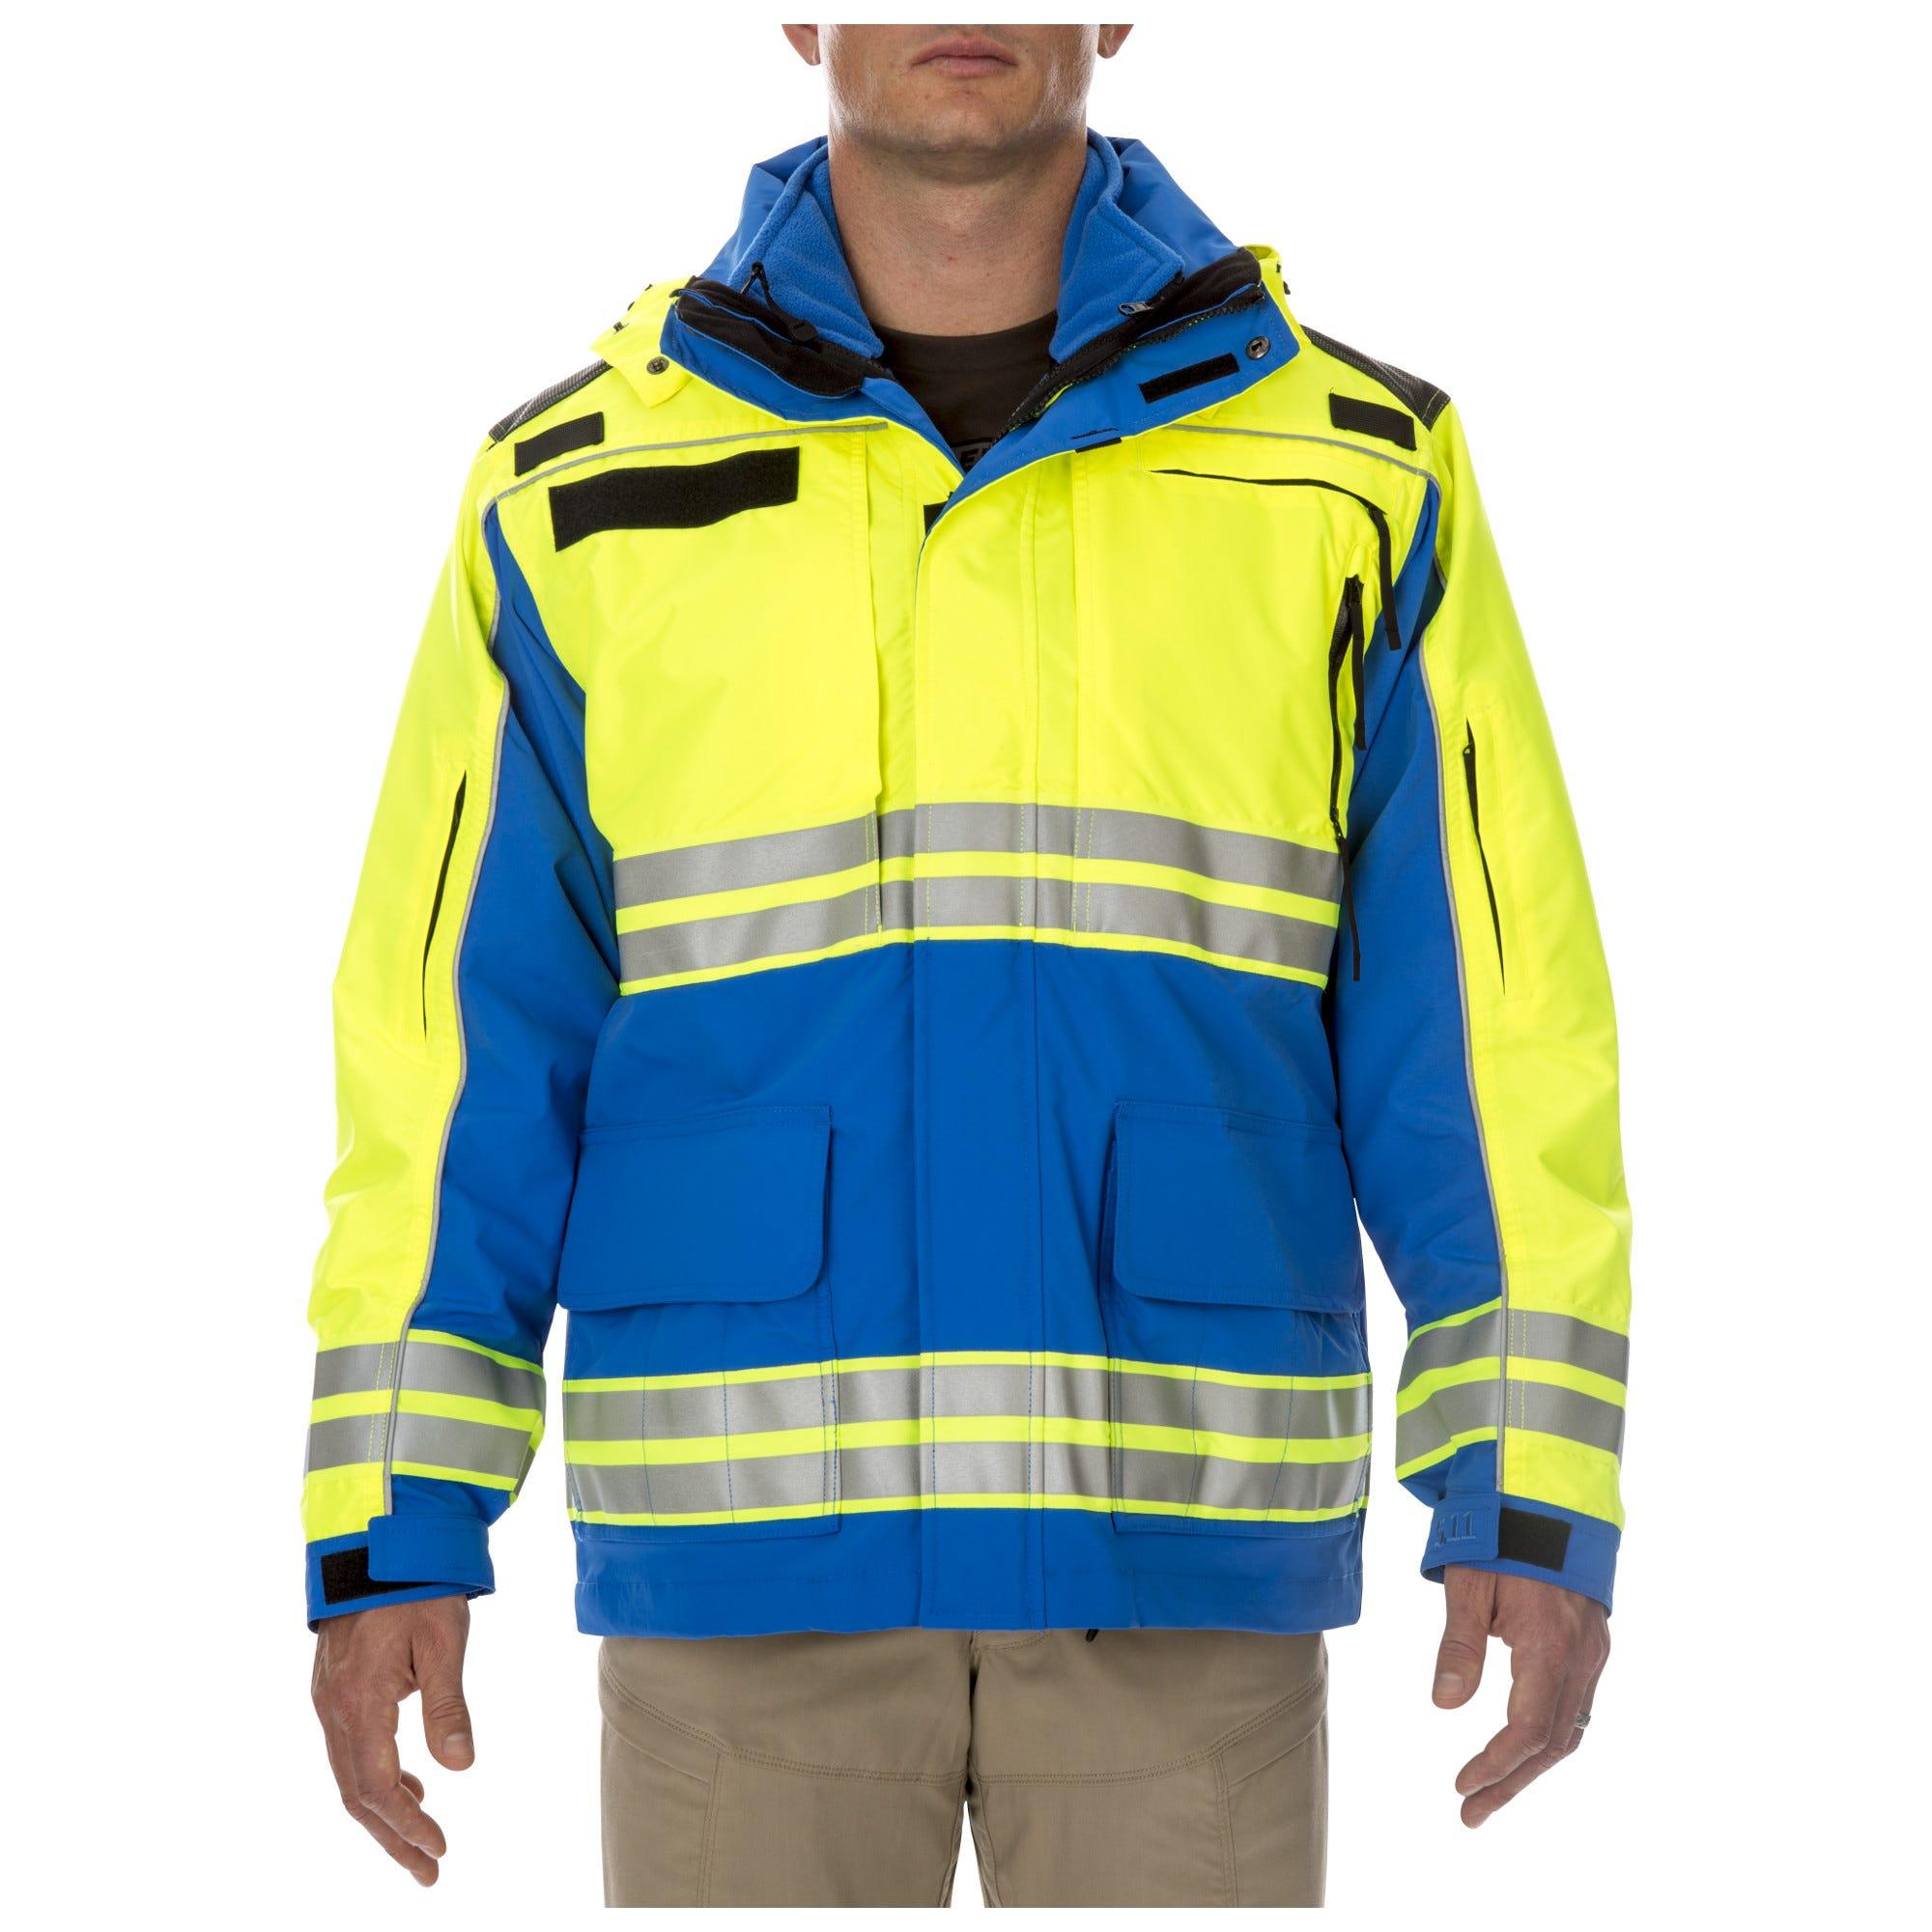 5.11 Tactical Men's Responder High-Visibility Parka Jacket (Blue)